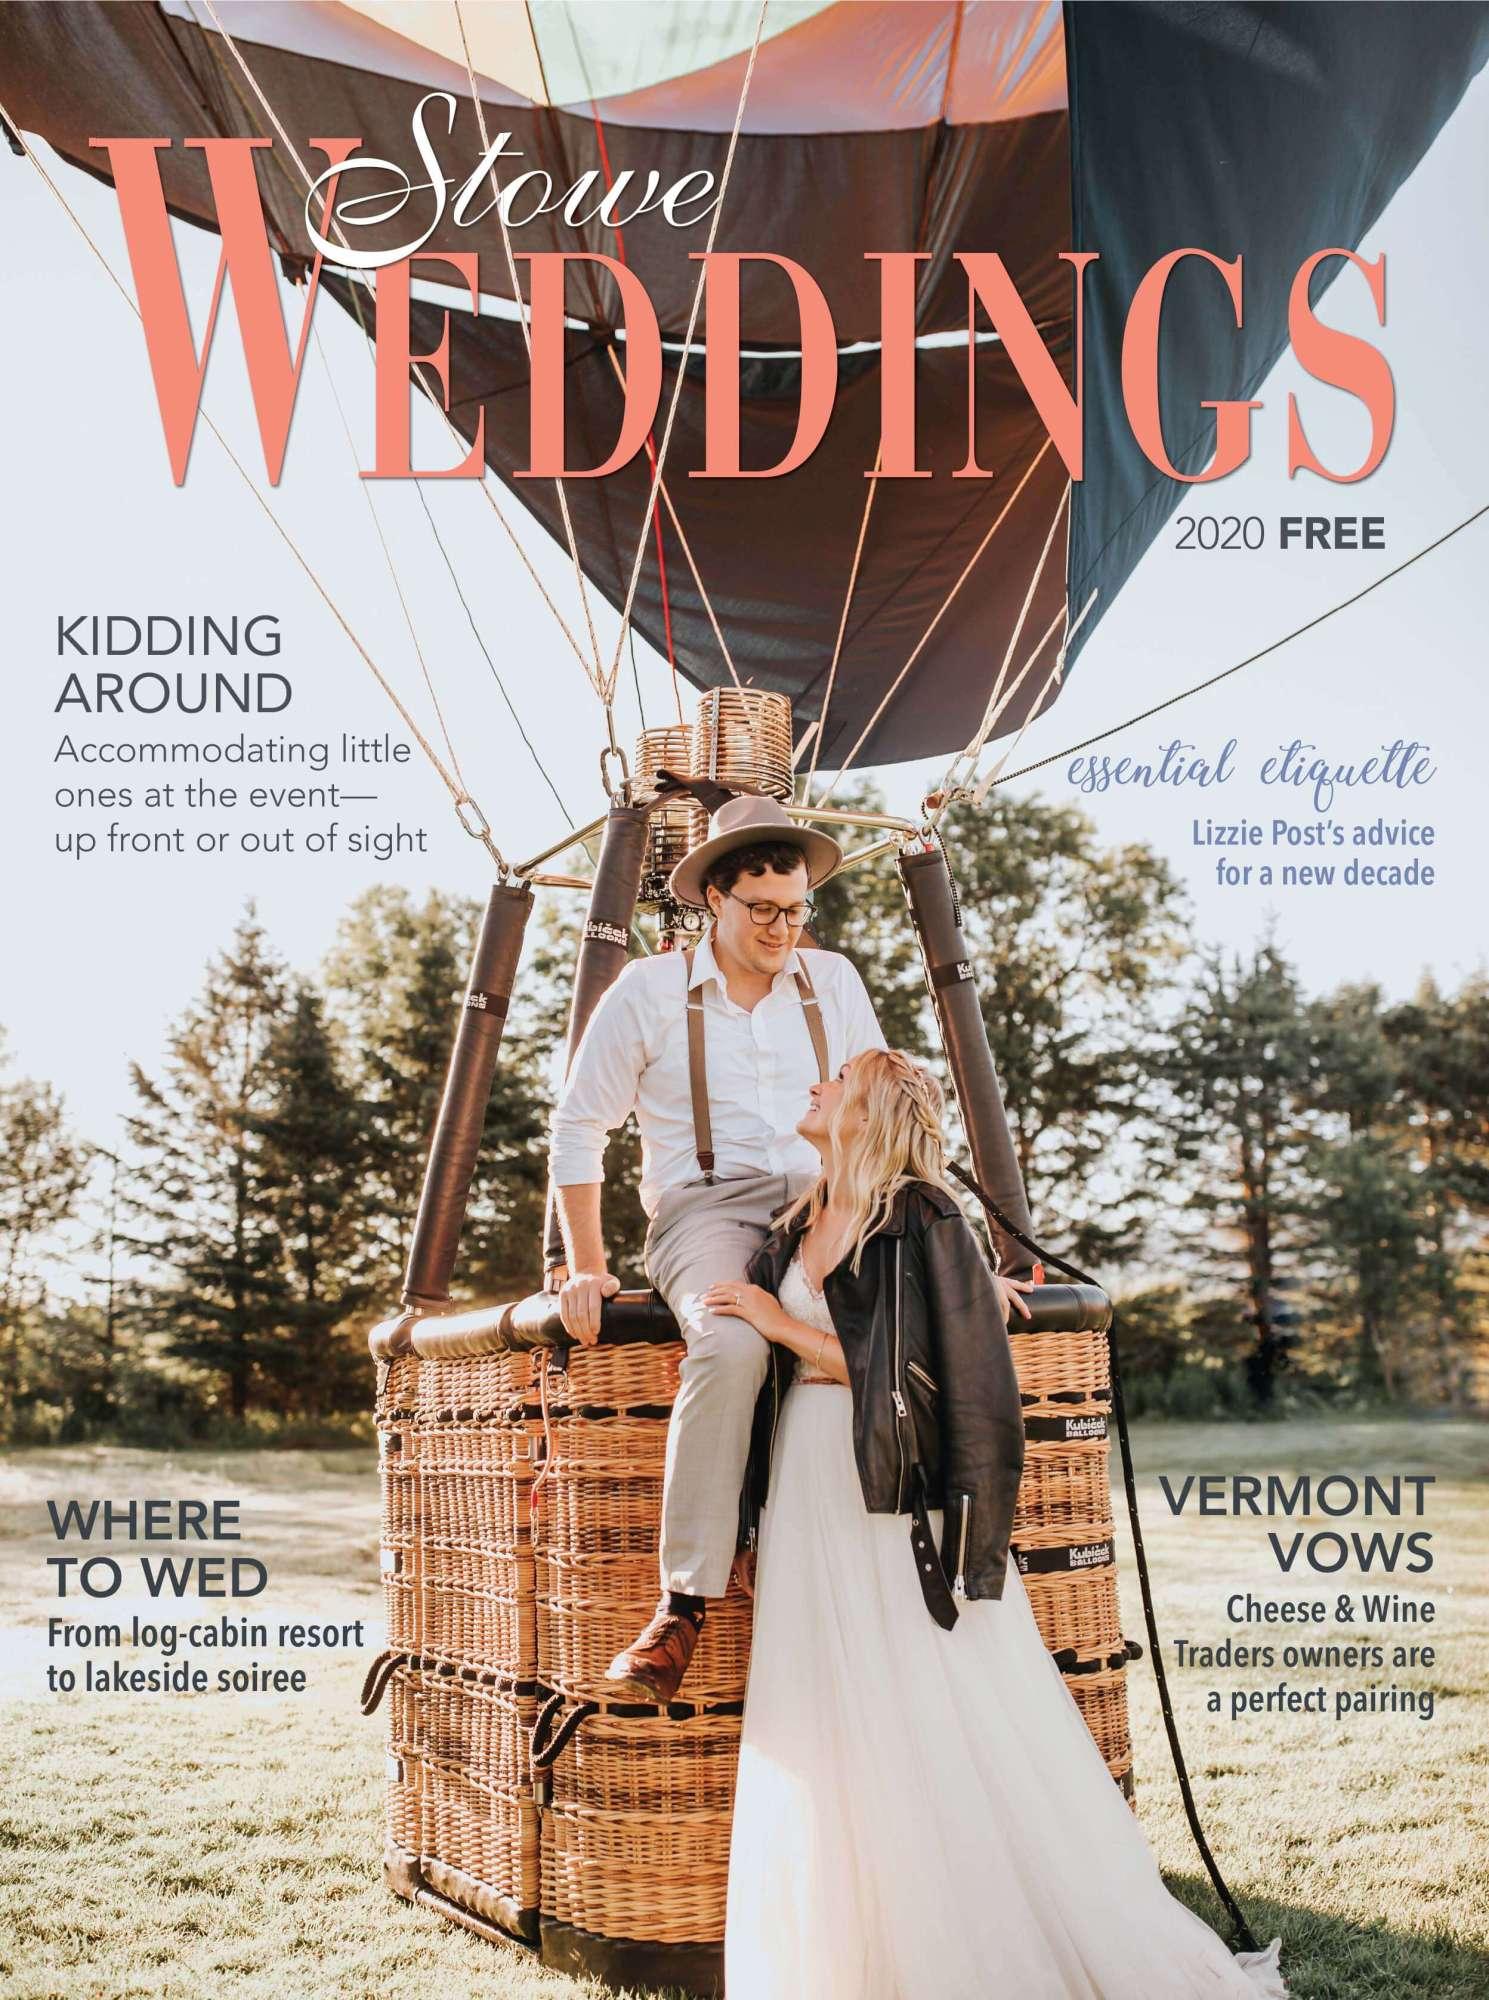 Stowe Weddings Magazine Cover